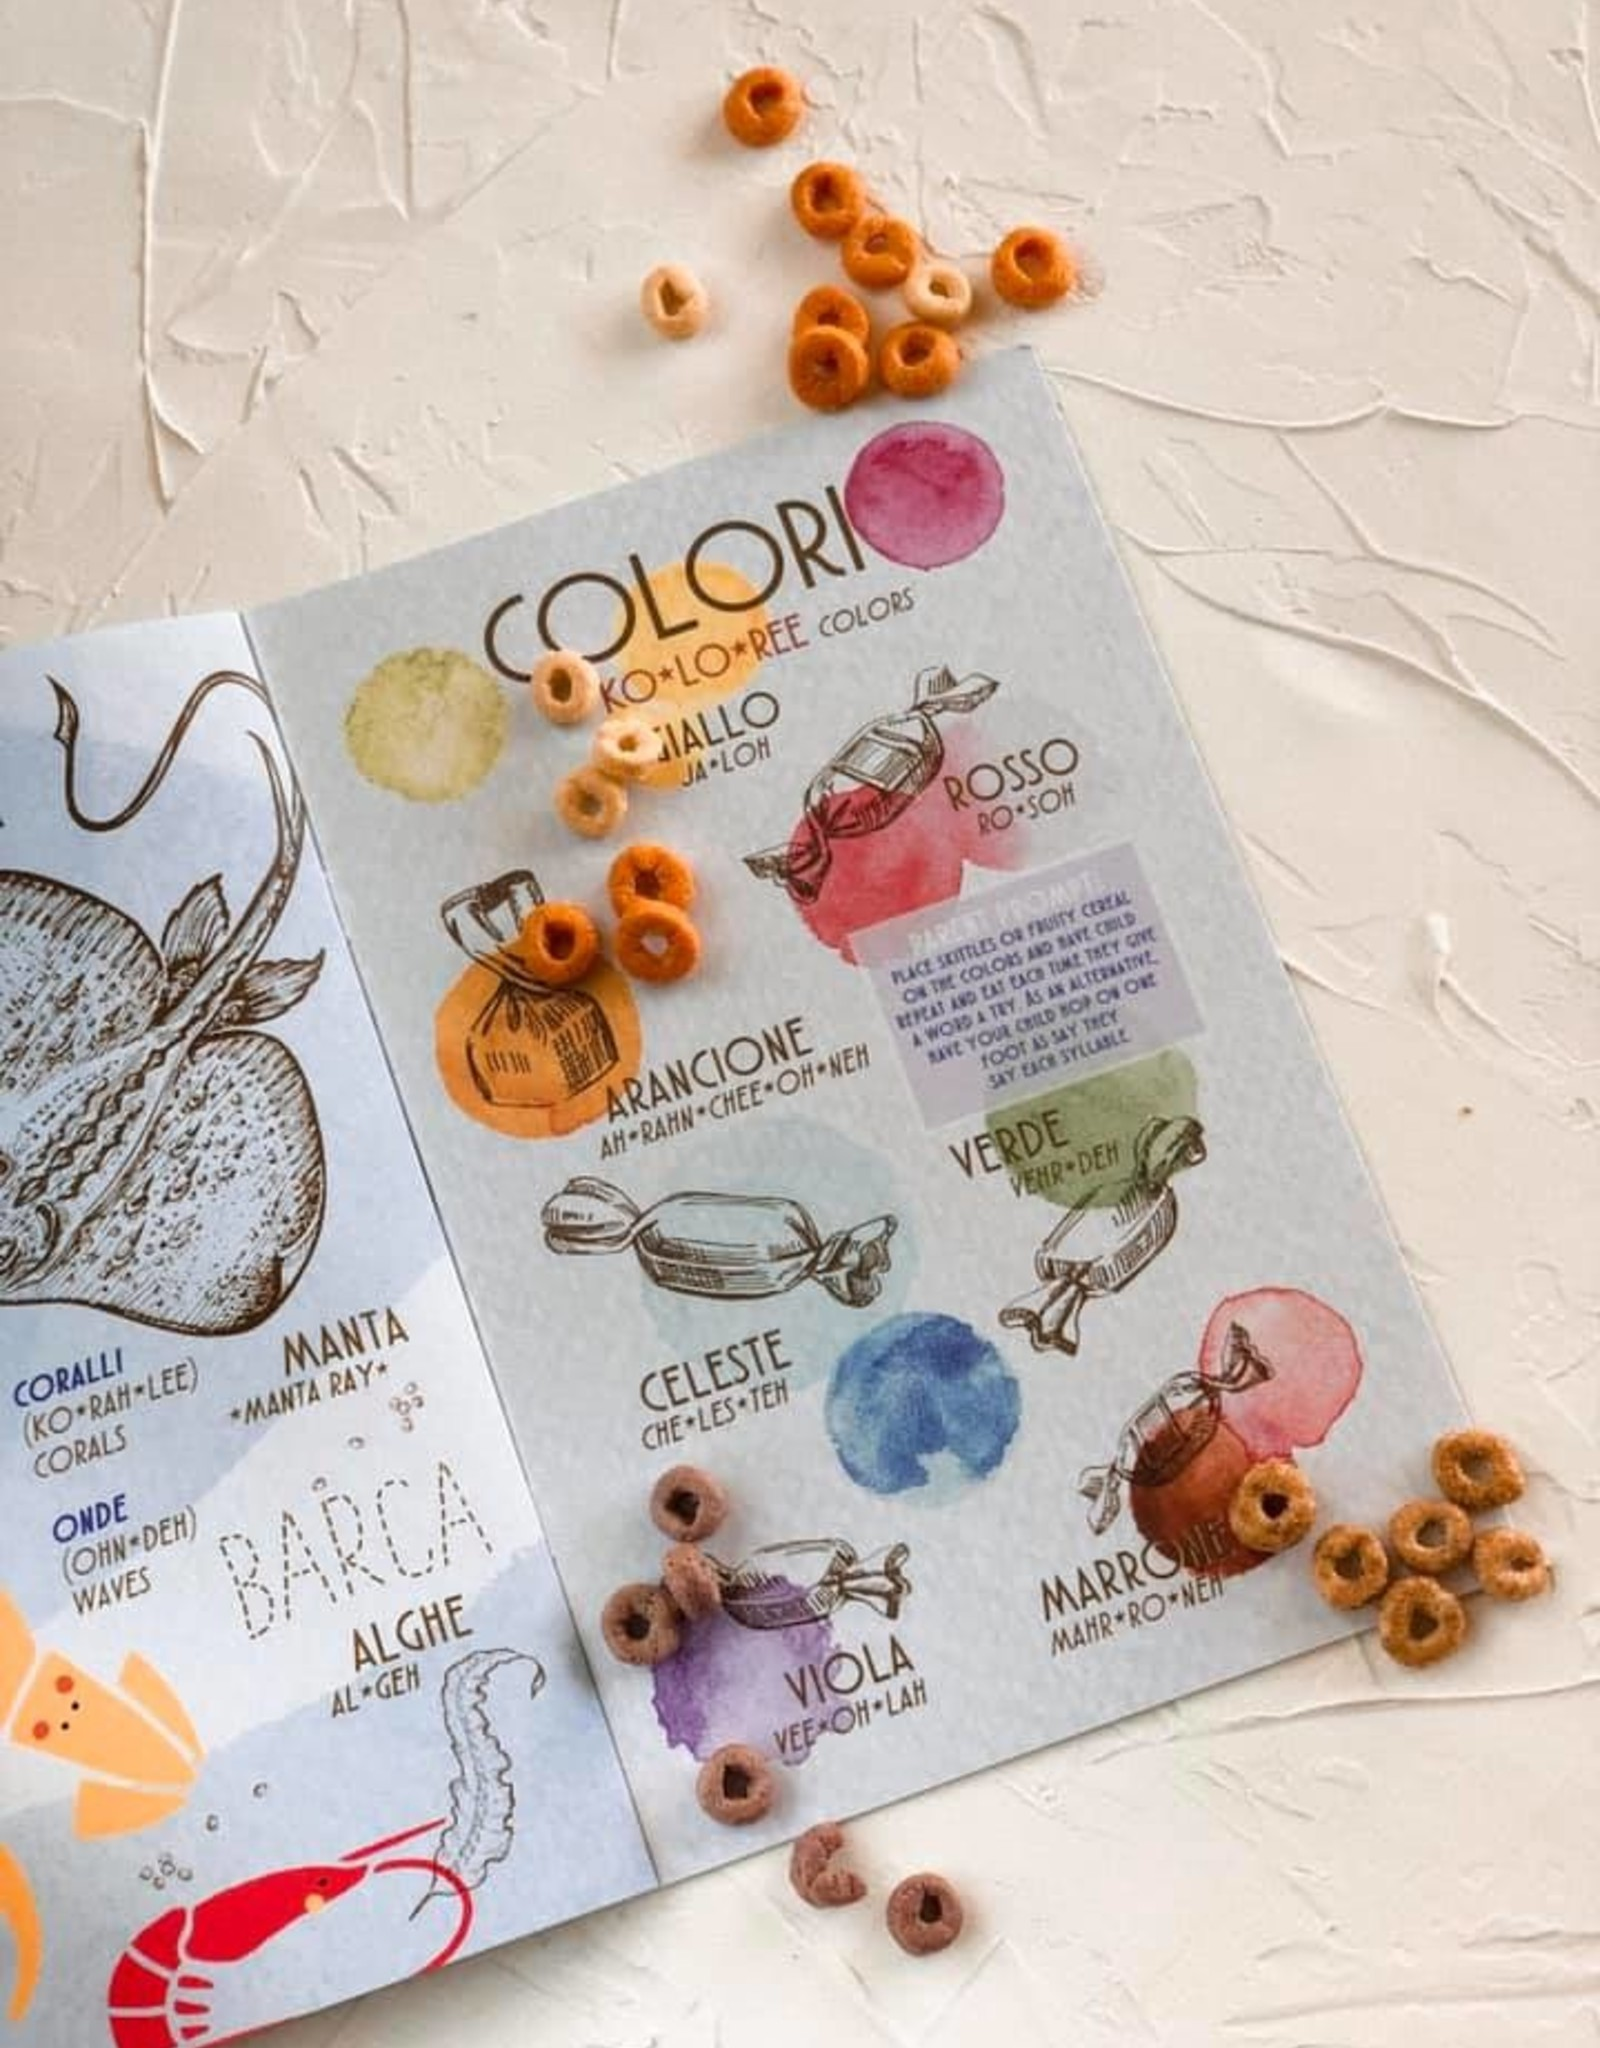 the visual poetic Kid's Handbook, Italian & English